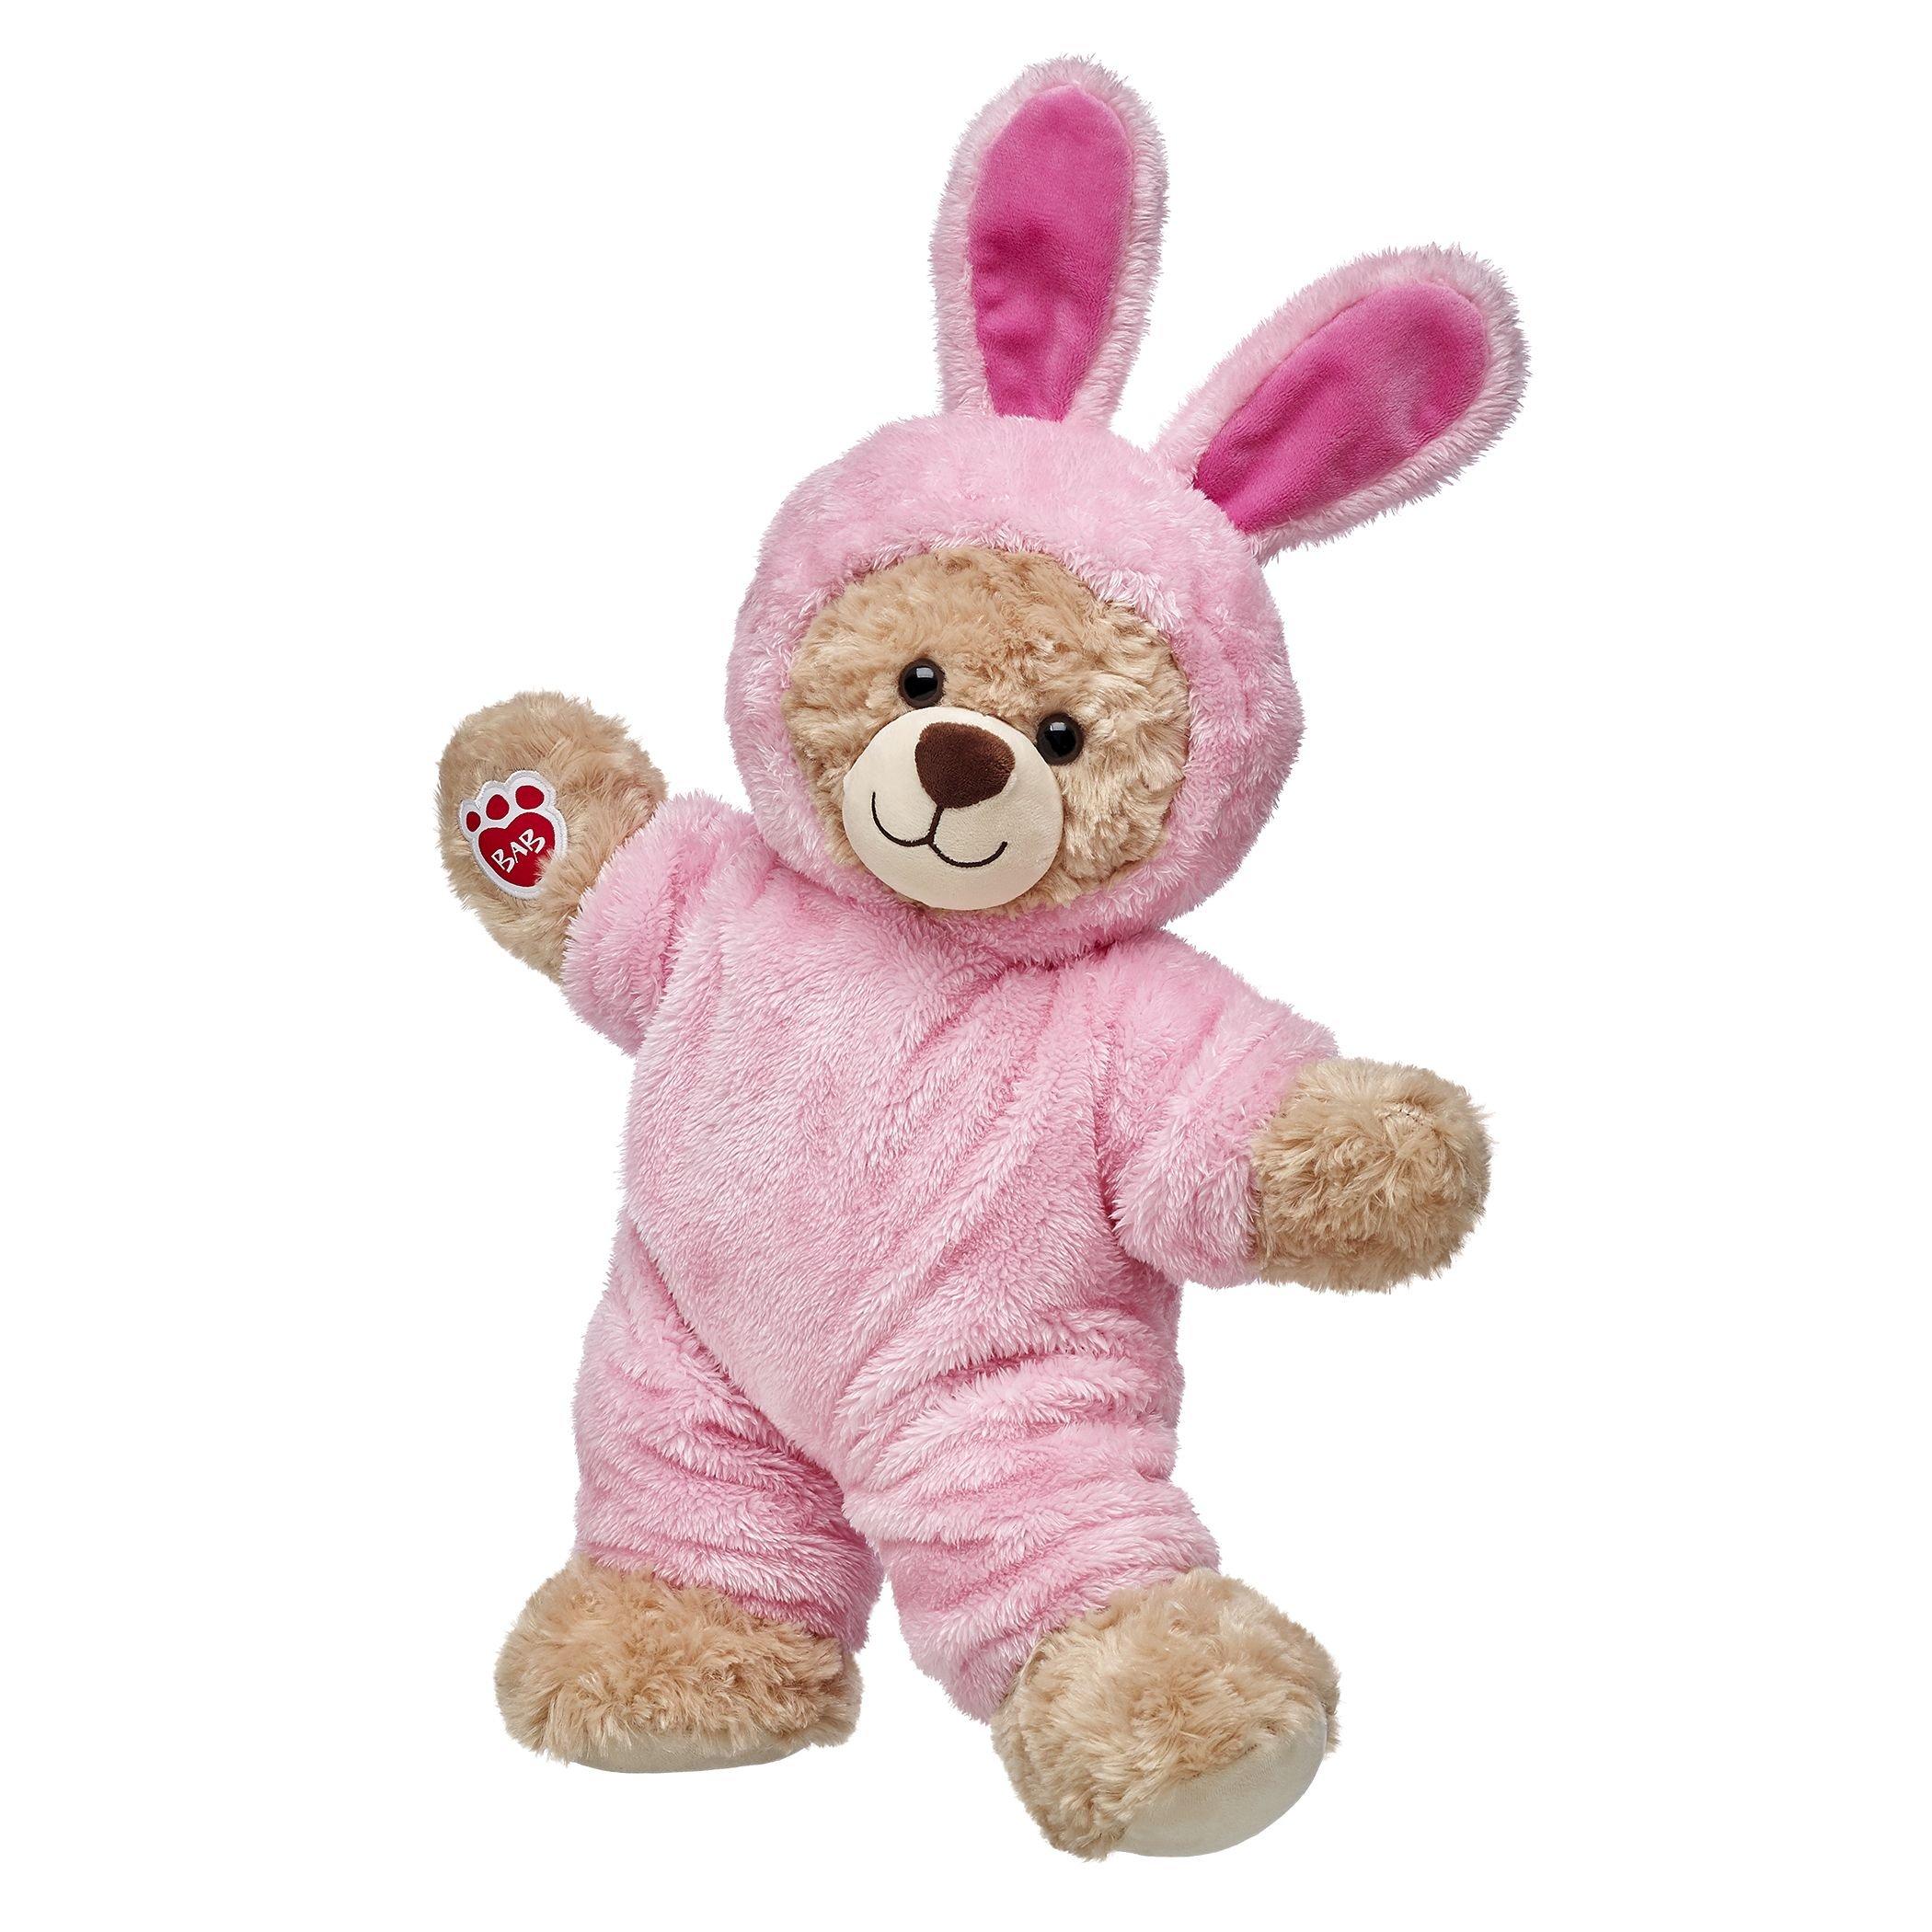 Build-a-Bear Workshop Happy Hugs Teddy Bear in Pink Bunny Costume Gift Set